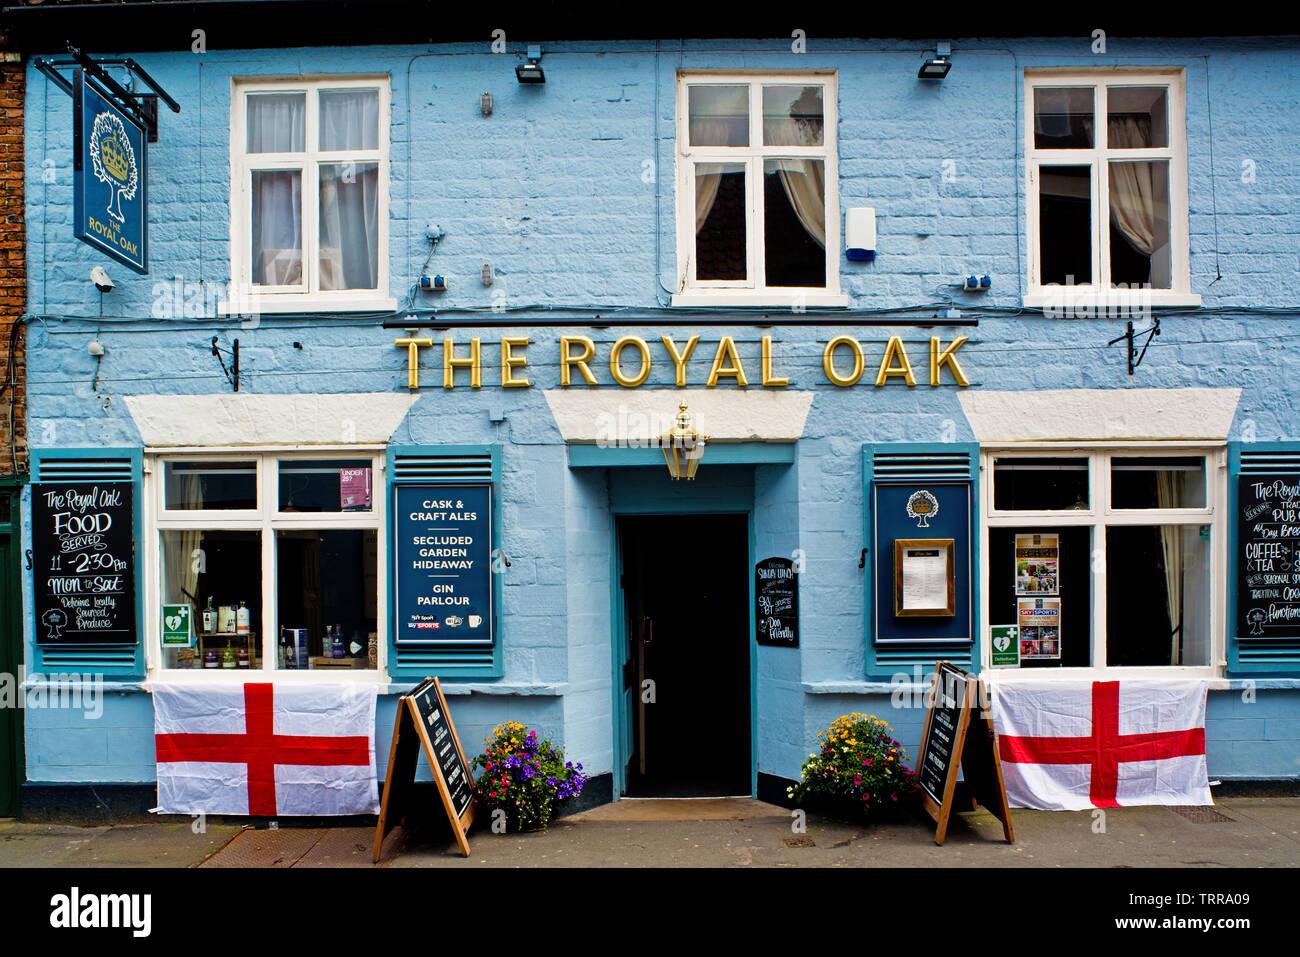 The Royal Oak, Malton, North Yorkshire, England Stock Photo